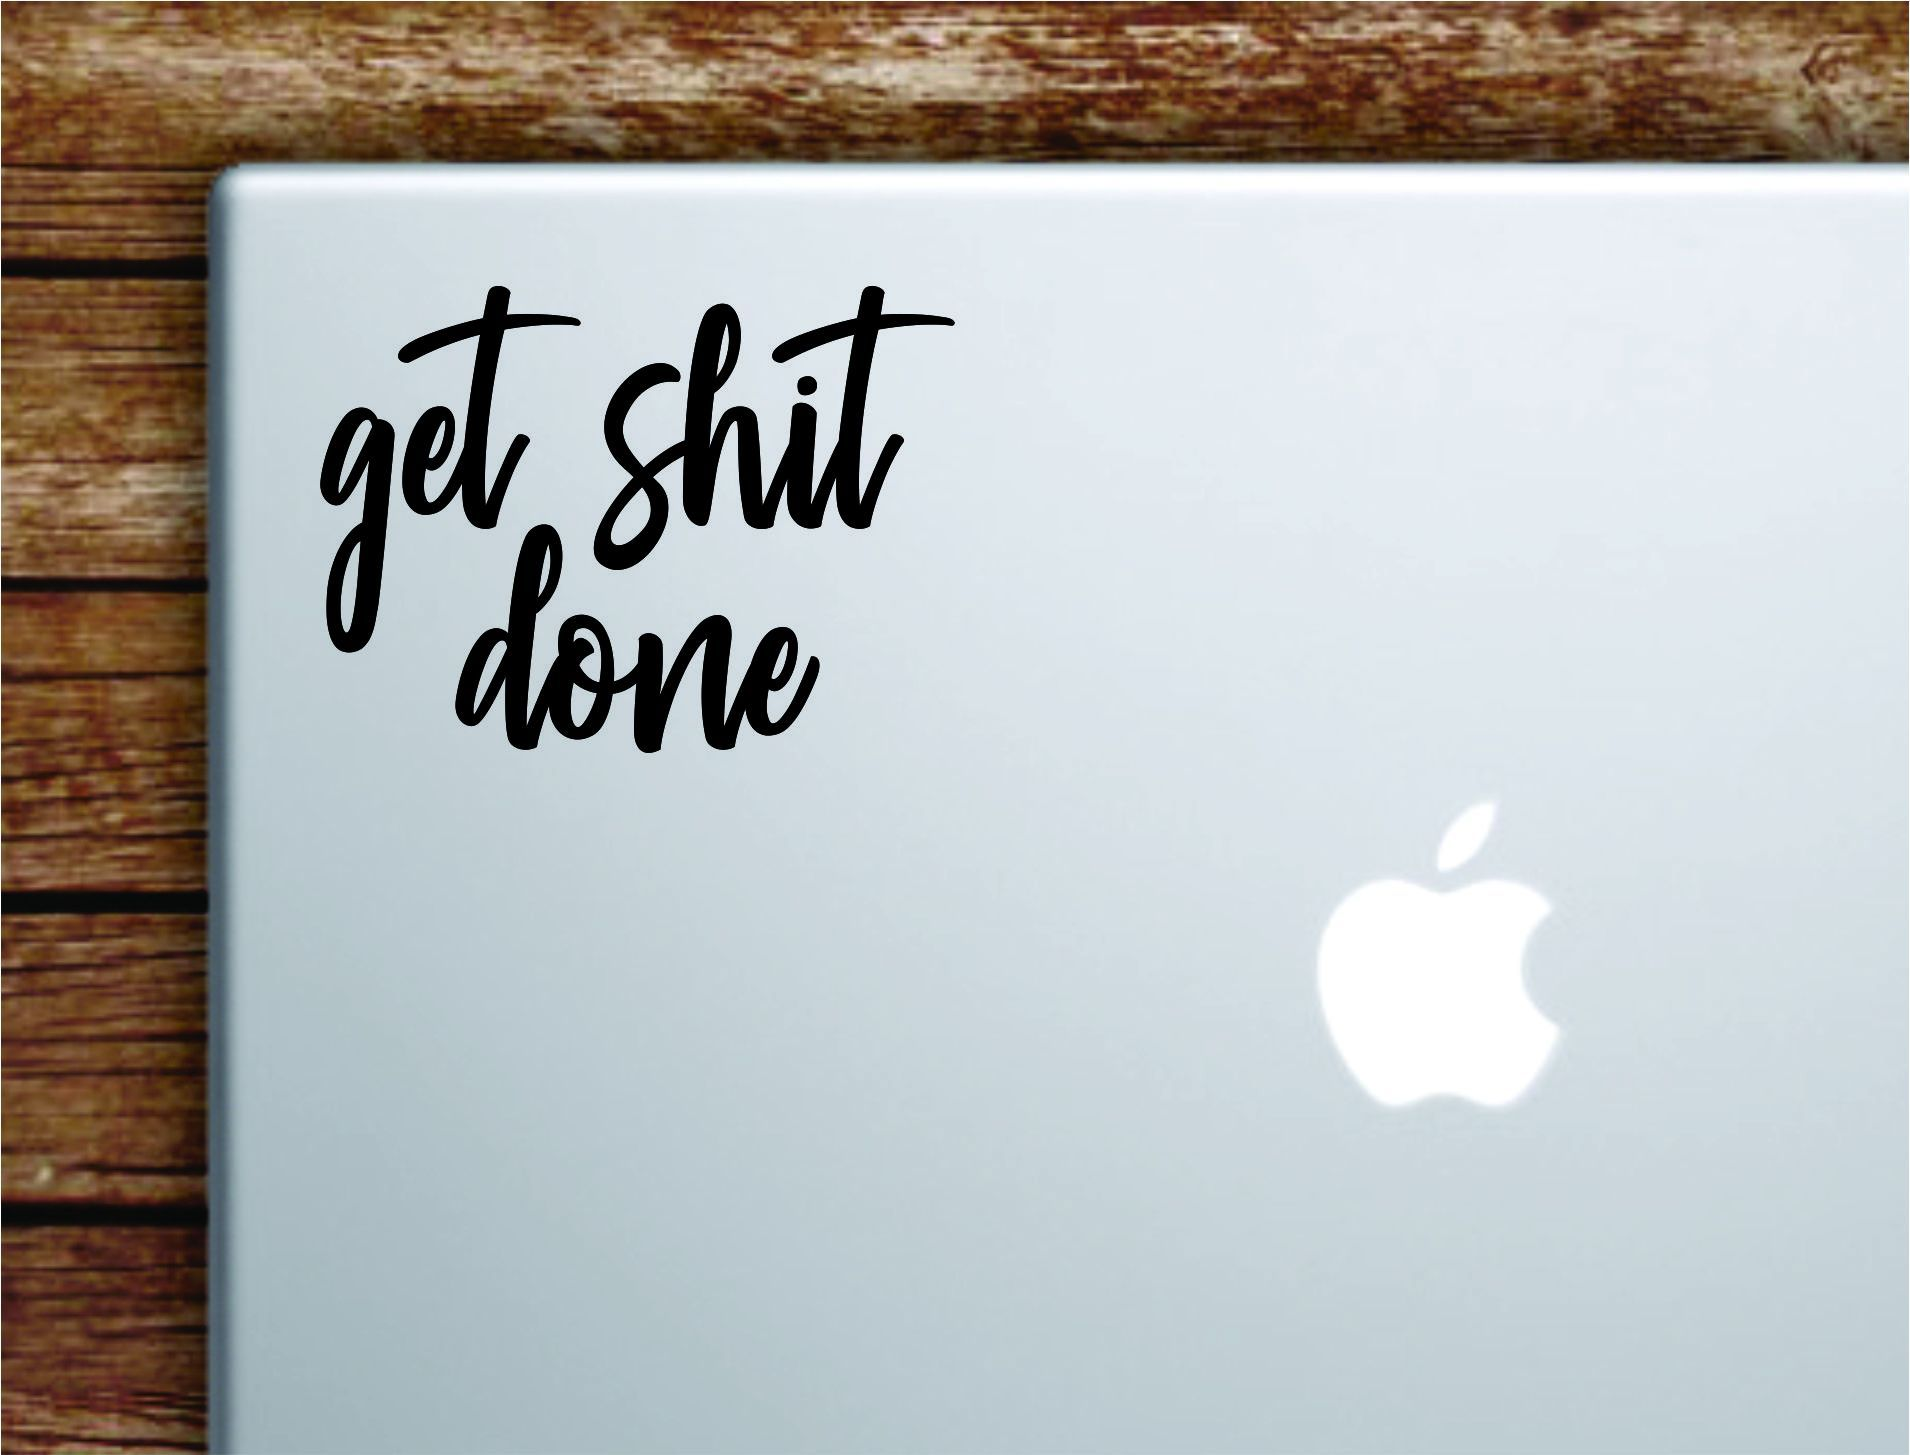 Get Shi Done V4 Laptop Wall Decal Sticker Vinyl Art Quote Macbook Apple Decor Car Window Truck Teen Inspirational Girls Gym Sports - green